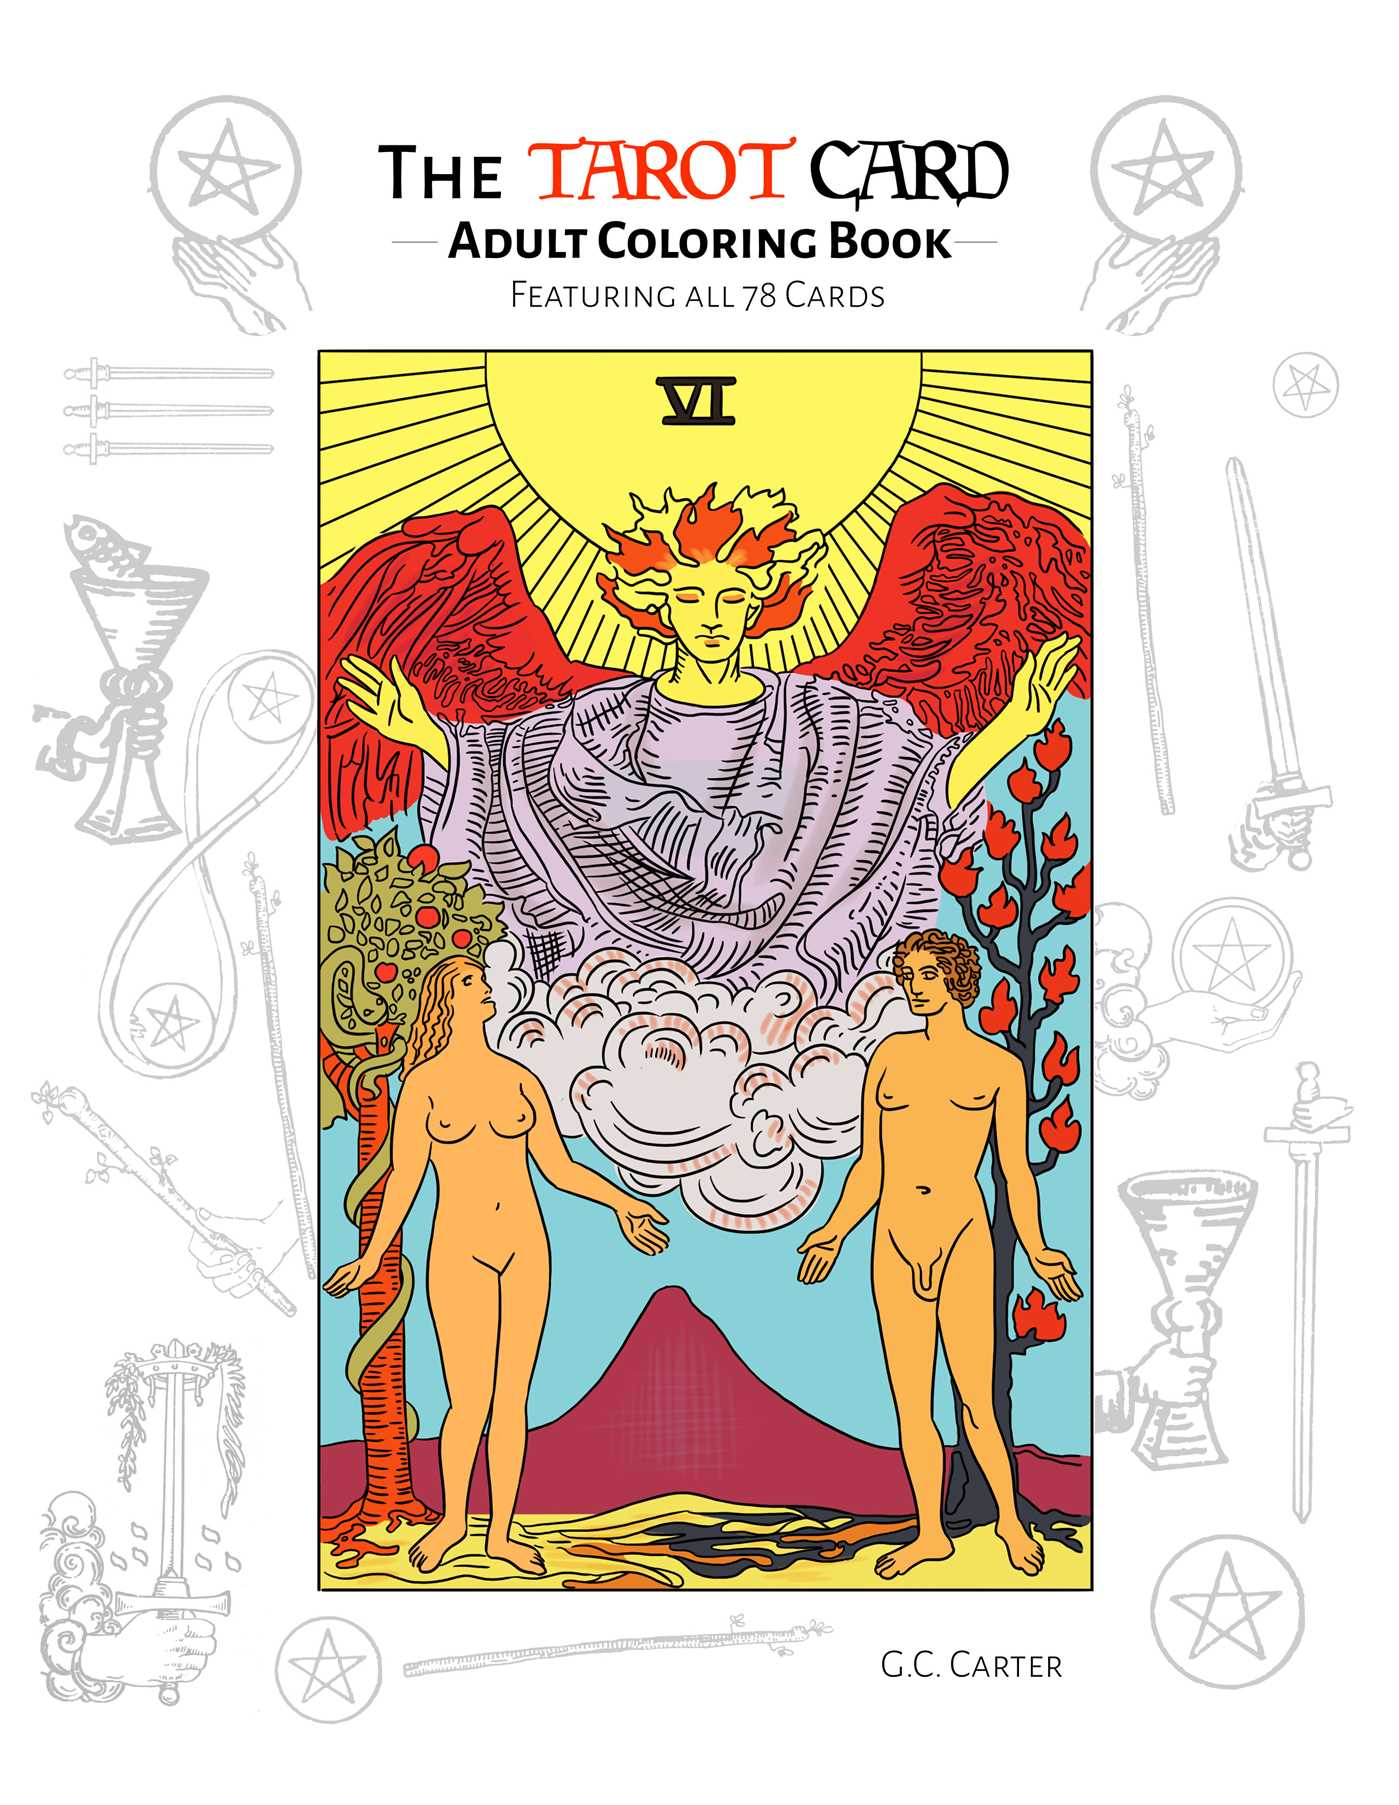 The tarot card adult coloring book 9781682612644 hr